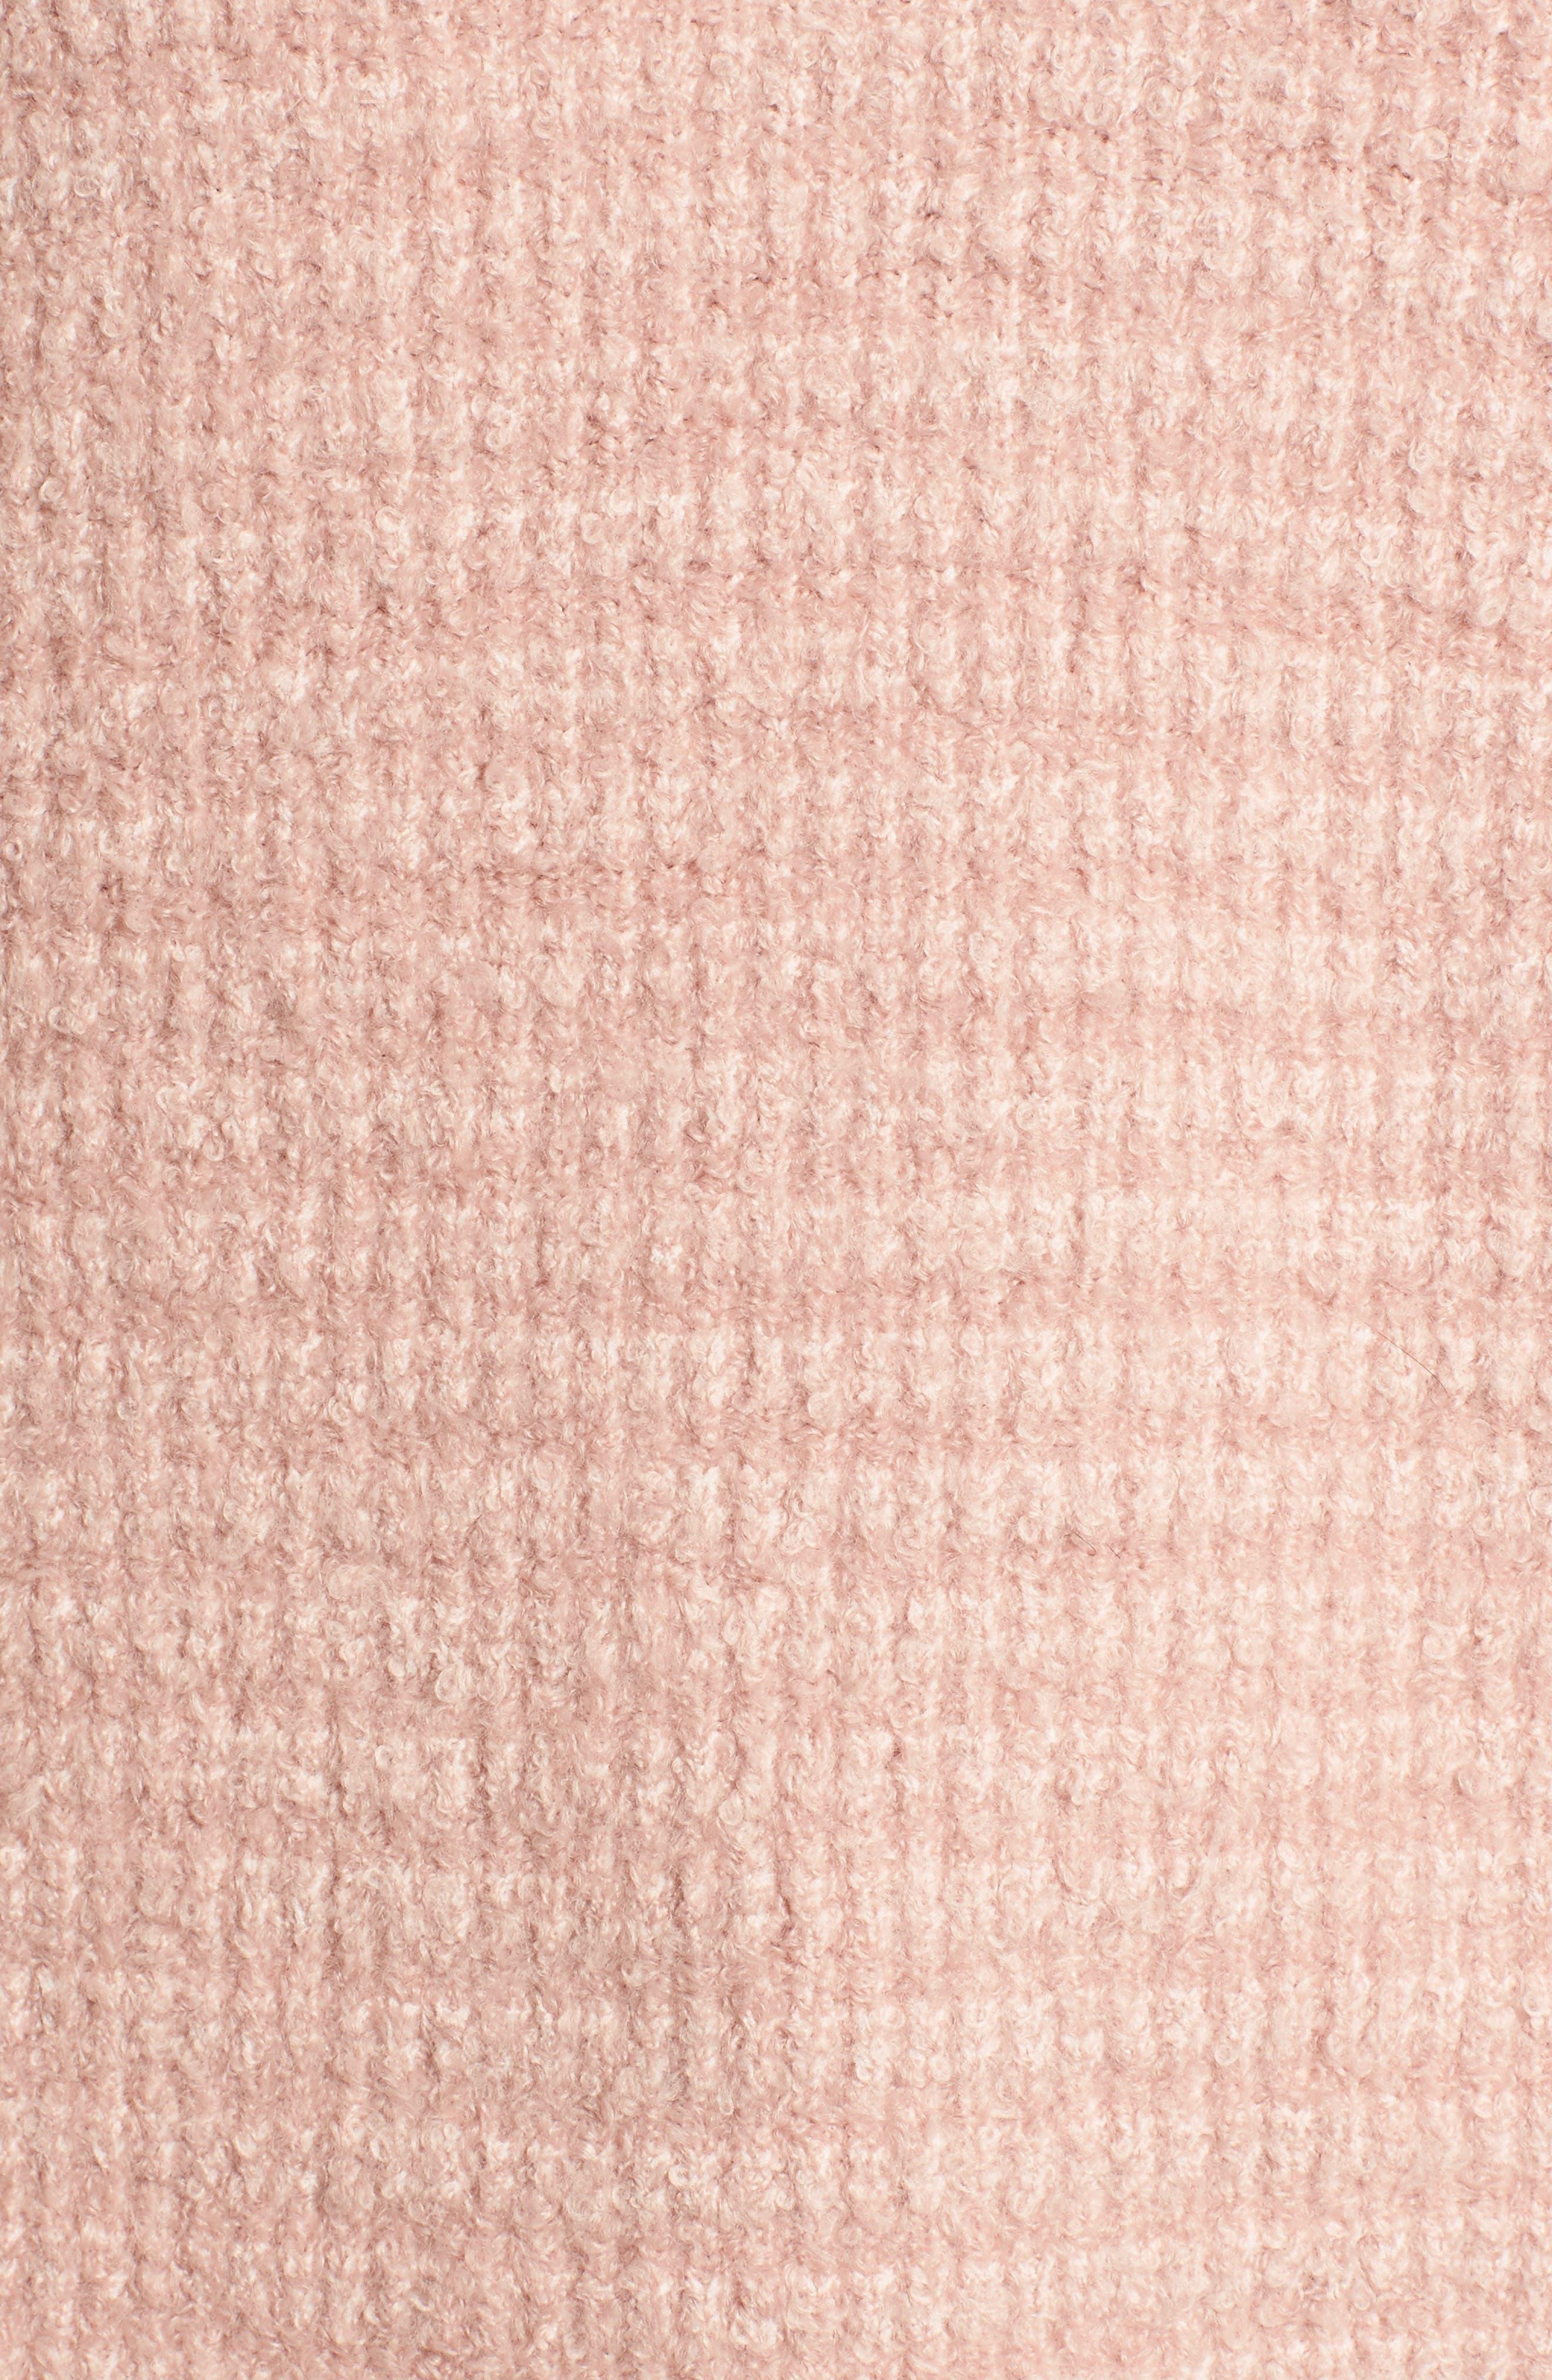 Lace Inset V-Neck Sweater,                             Alternate thumbnail 5, color,                             650